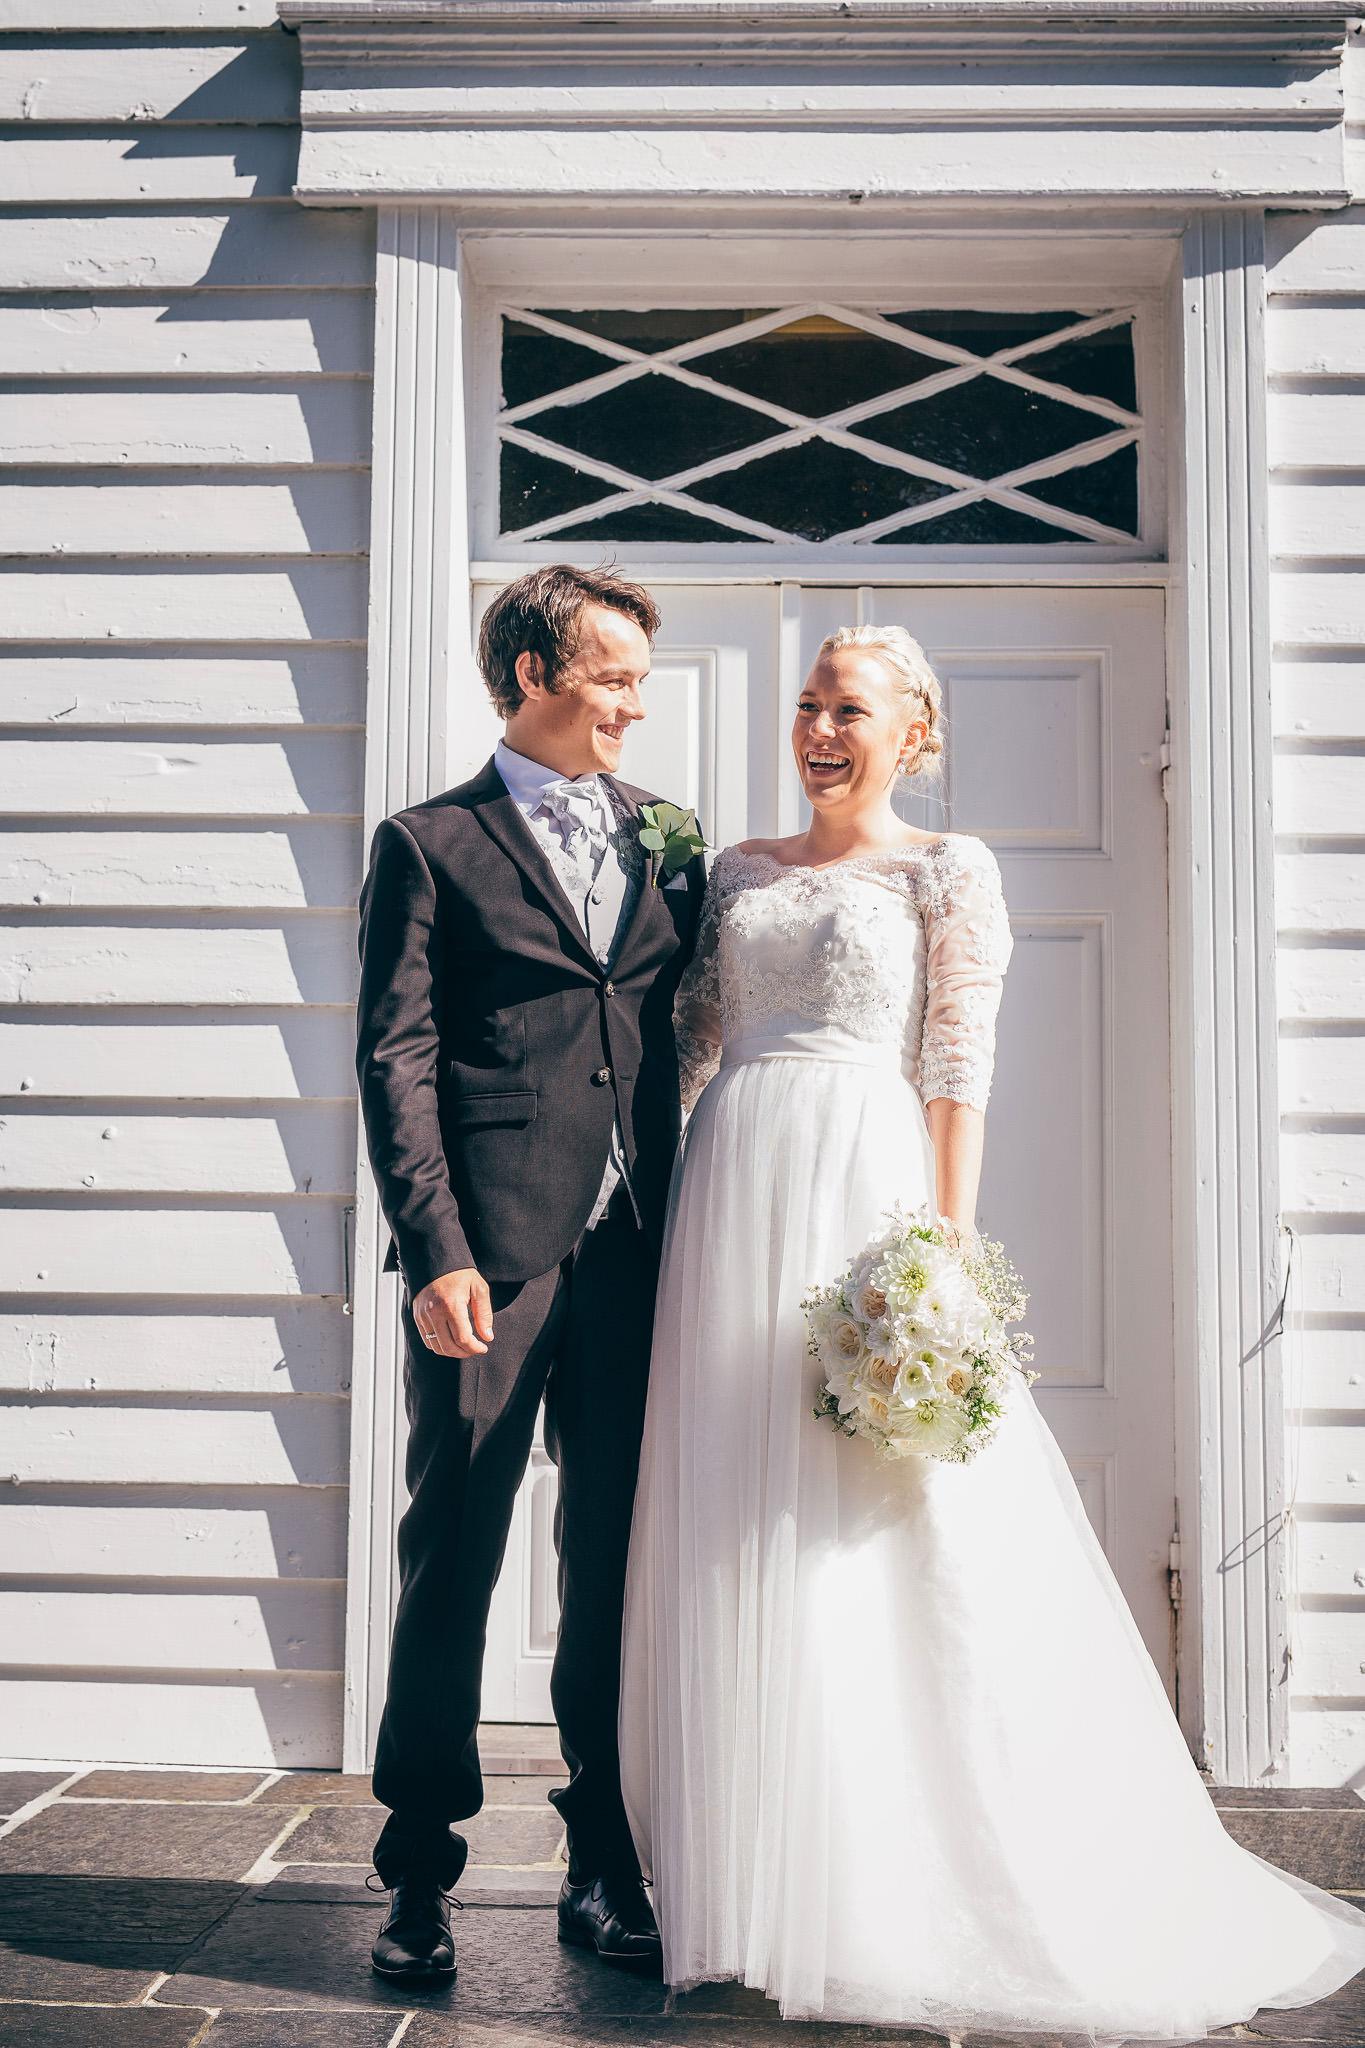 Wedding+Photographer+Norway+Bryllupsfotograf+Casey+Arneson+JT-71.jpg